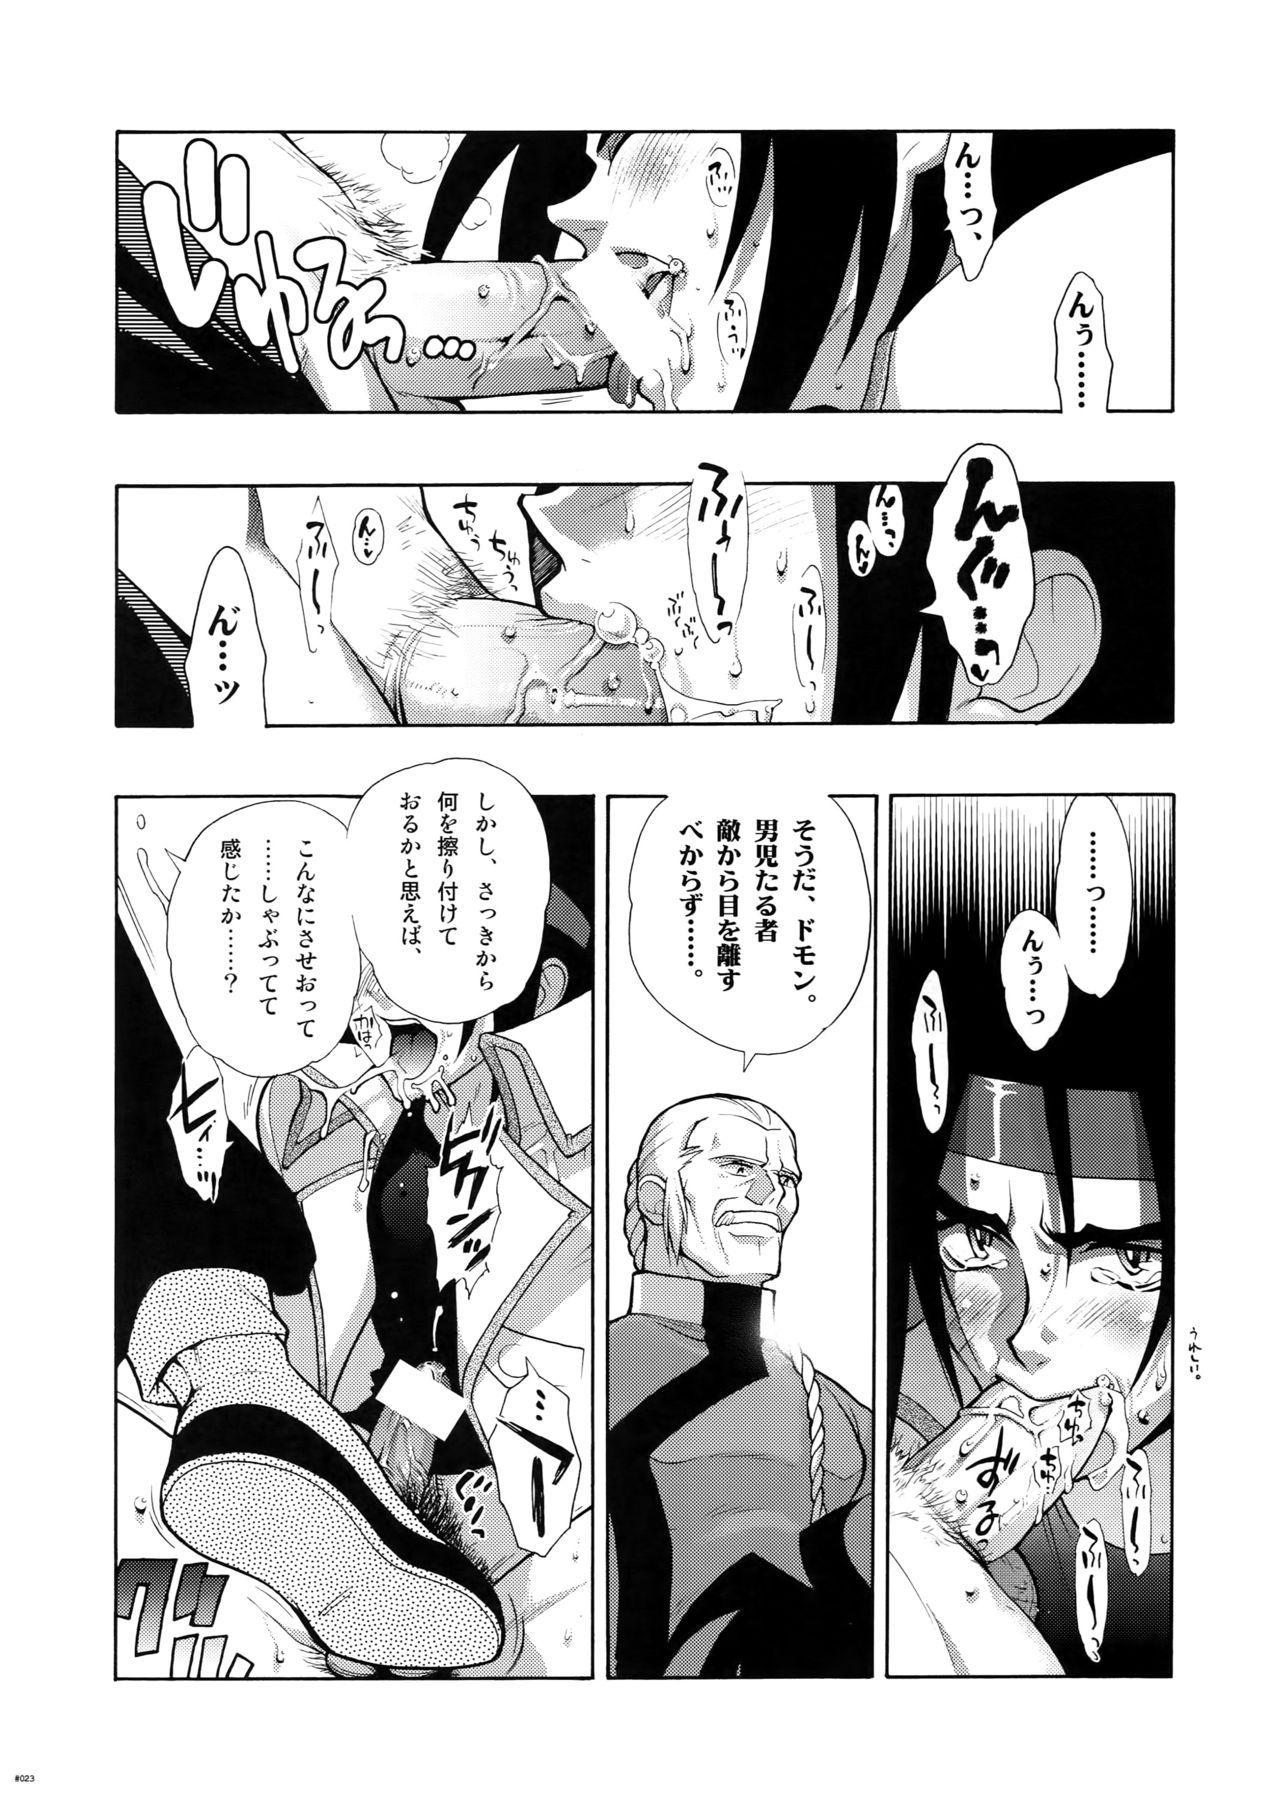 [Article 60 of Criminal Code (Shuhan)] G-gan Josei-Muke Sairoku-Shuu (G Gundam) 22